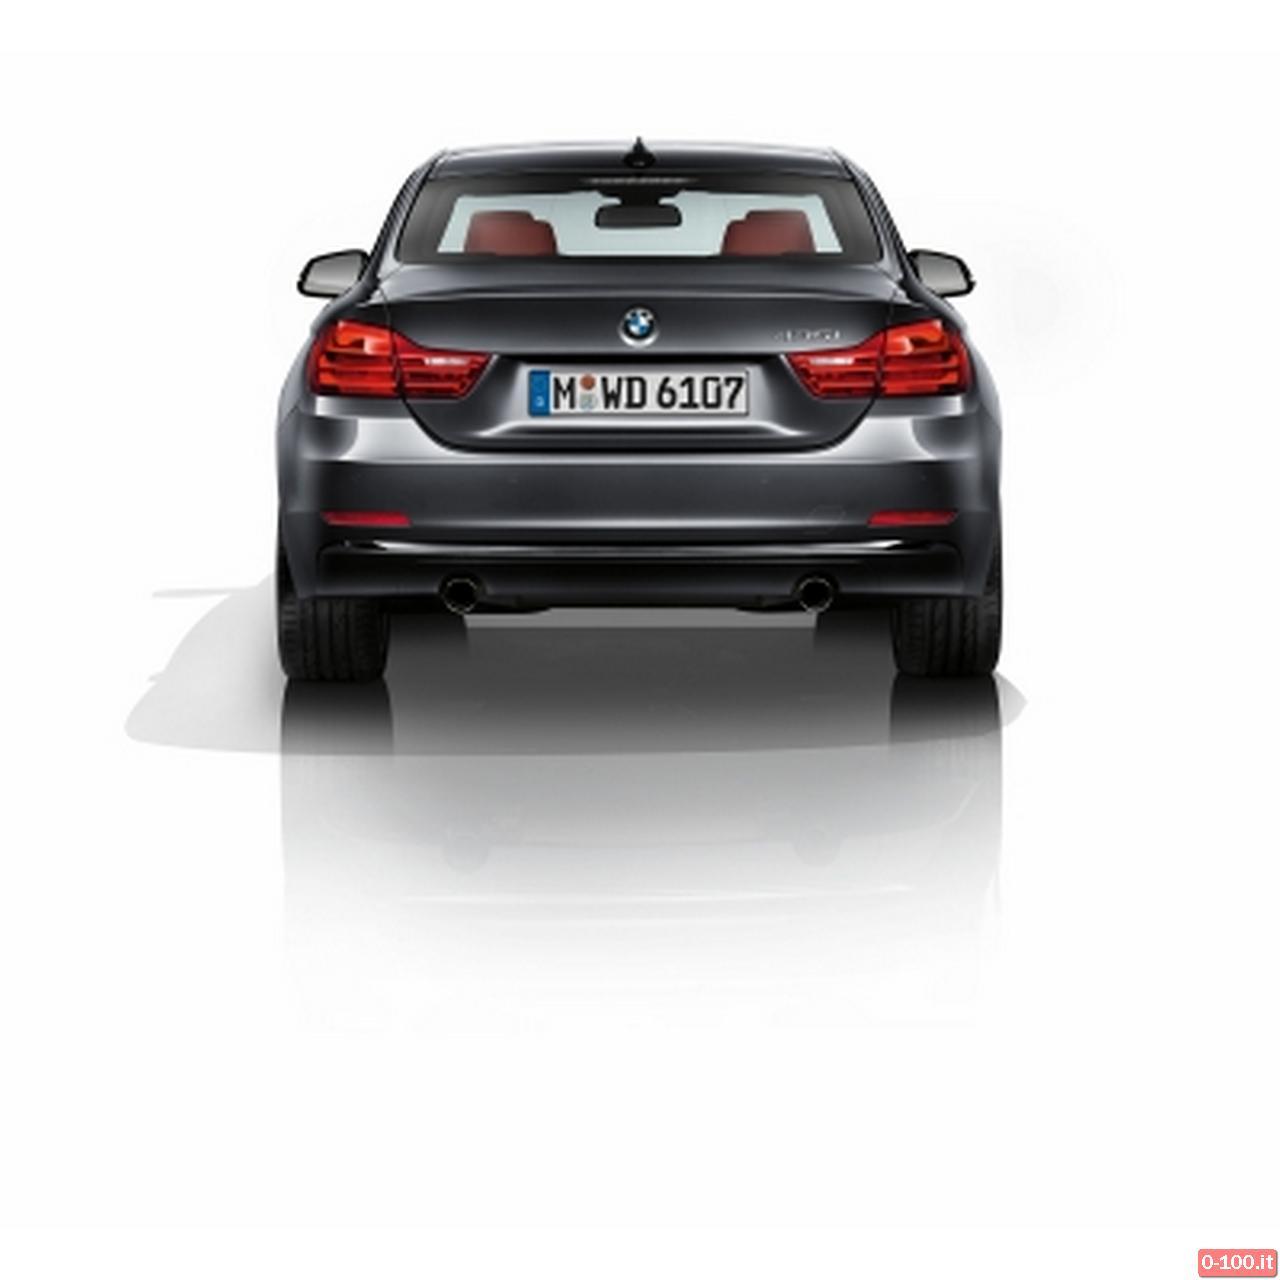 bmw_serie-4-coupé_0-100_53